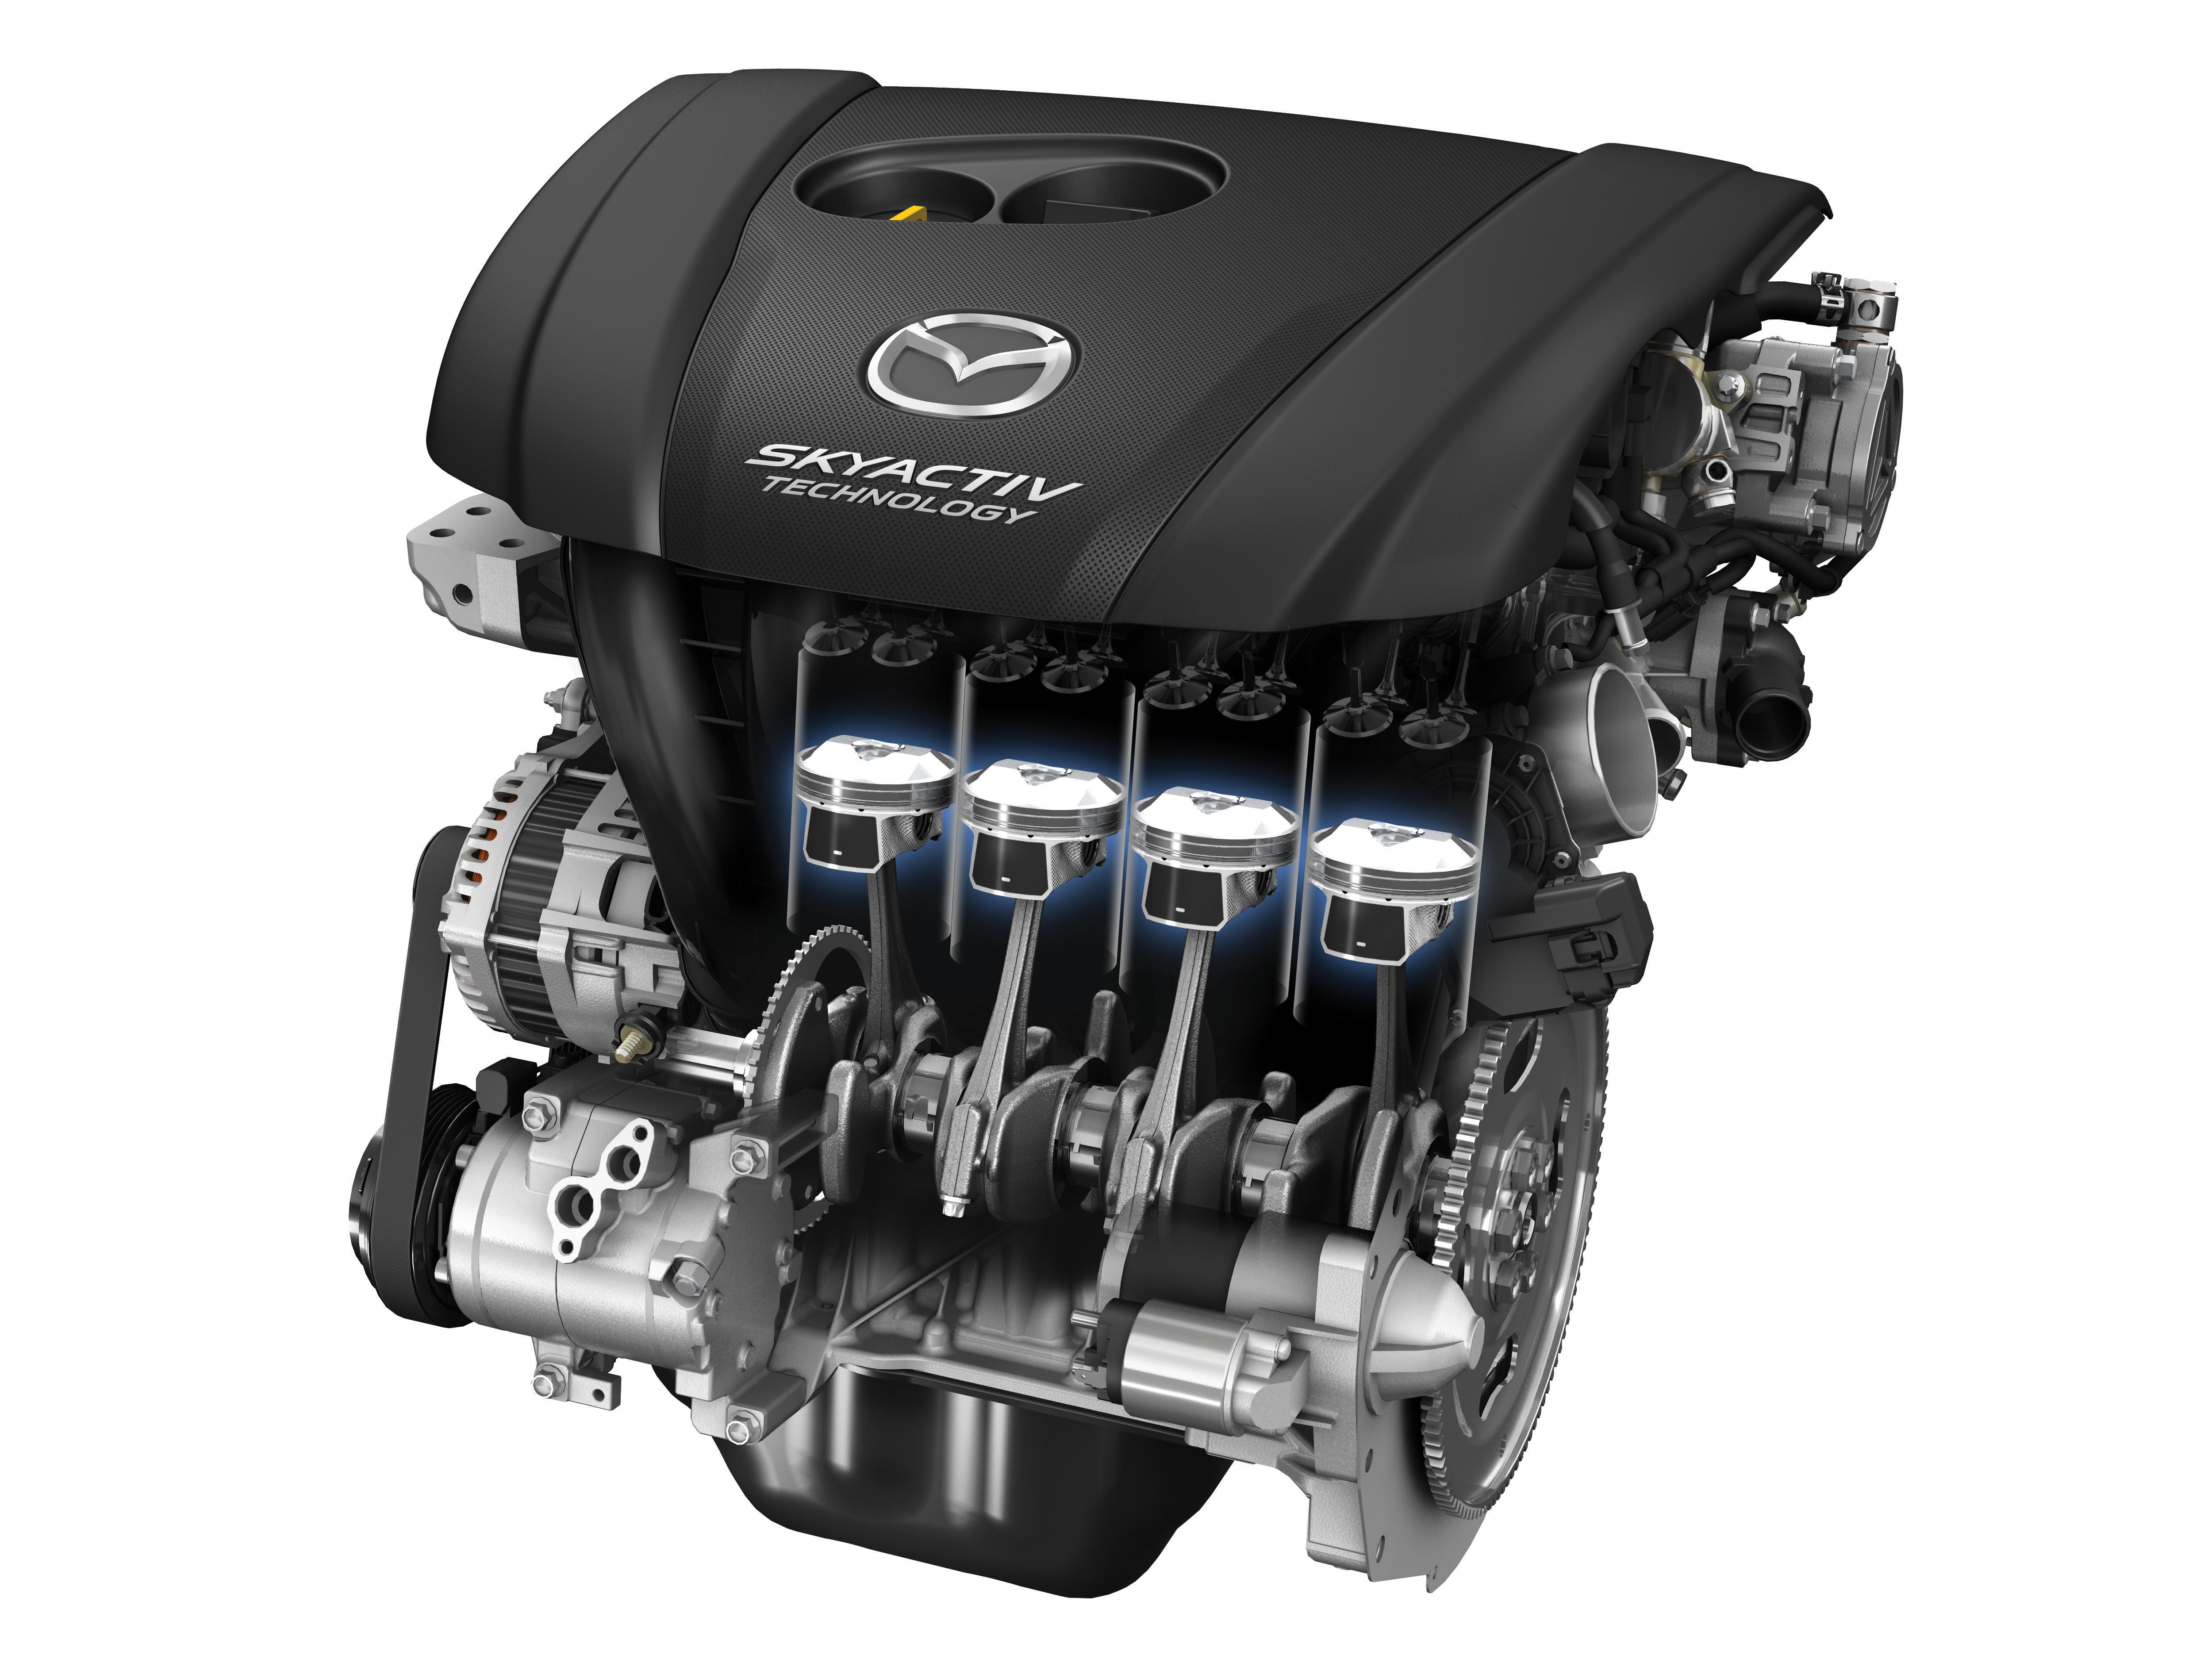 diesel engine of the year mazda skyactiv diesel. Black Bedroom Furniture Sets. Home Design Ideas